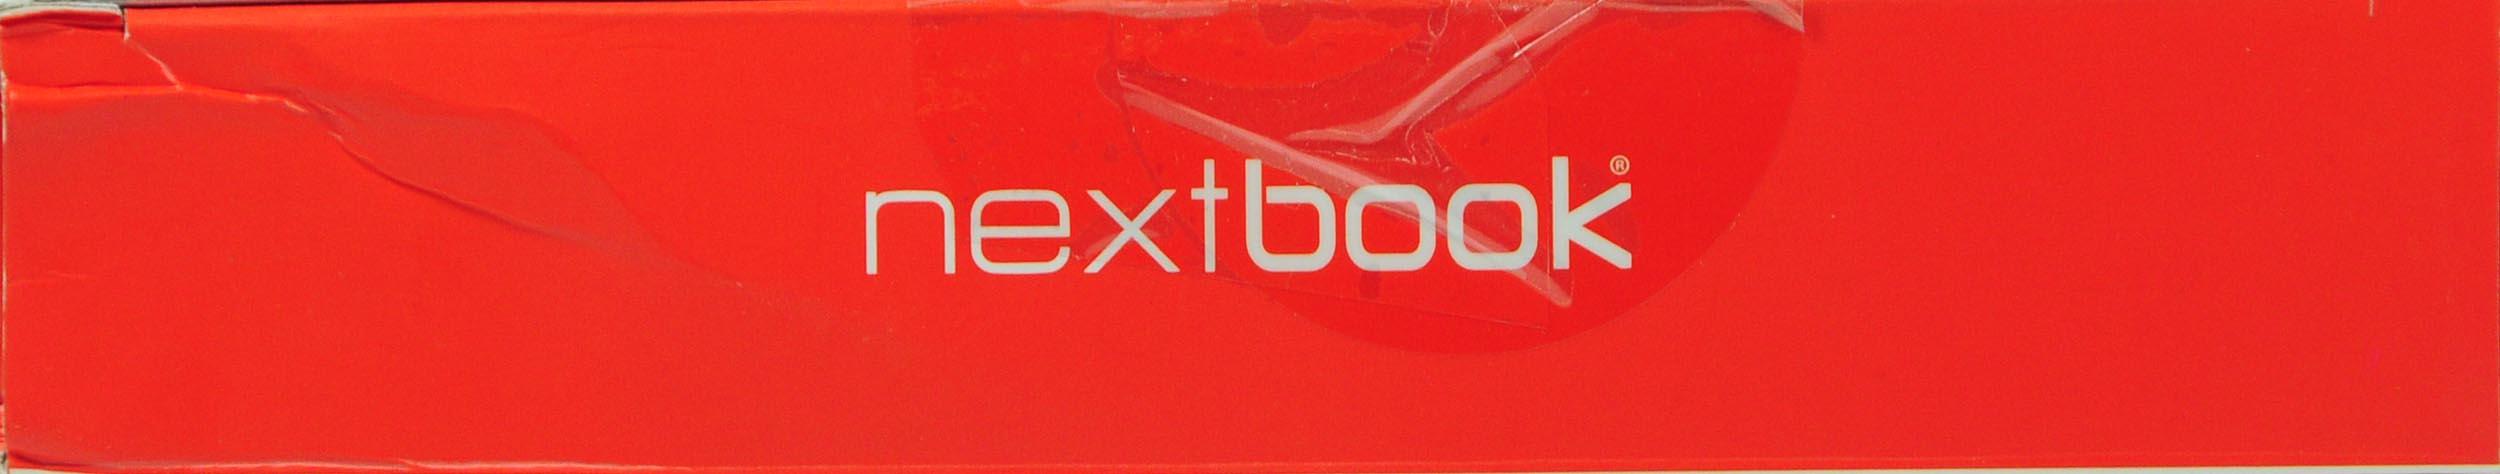 Nextbook Ares 8 Tablet 16gb Intel Atom Z3735g Quad Core Processor 2 Speed Swamp Cooler Motor Wiring Diagram